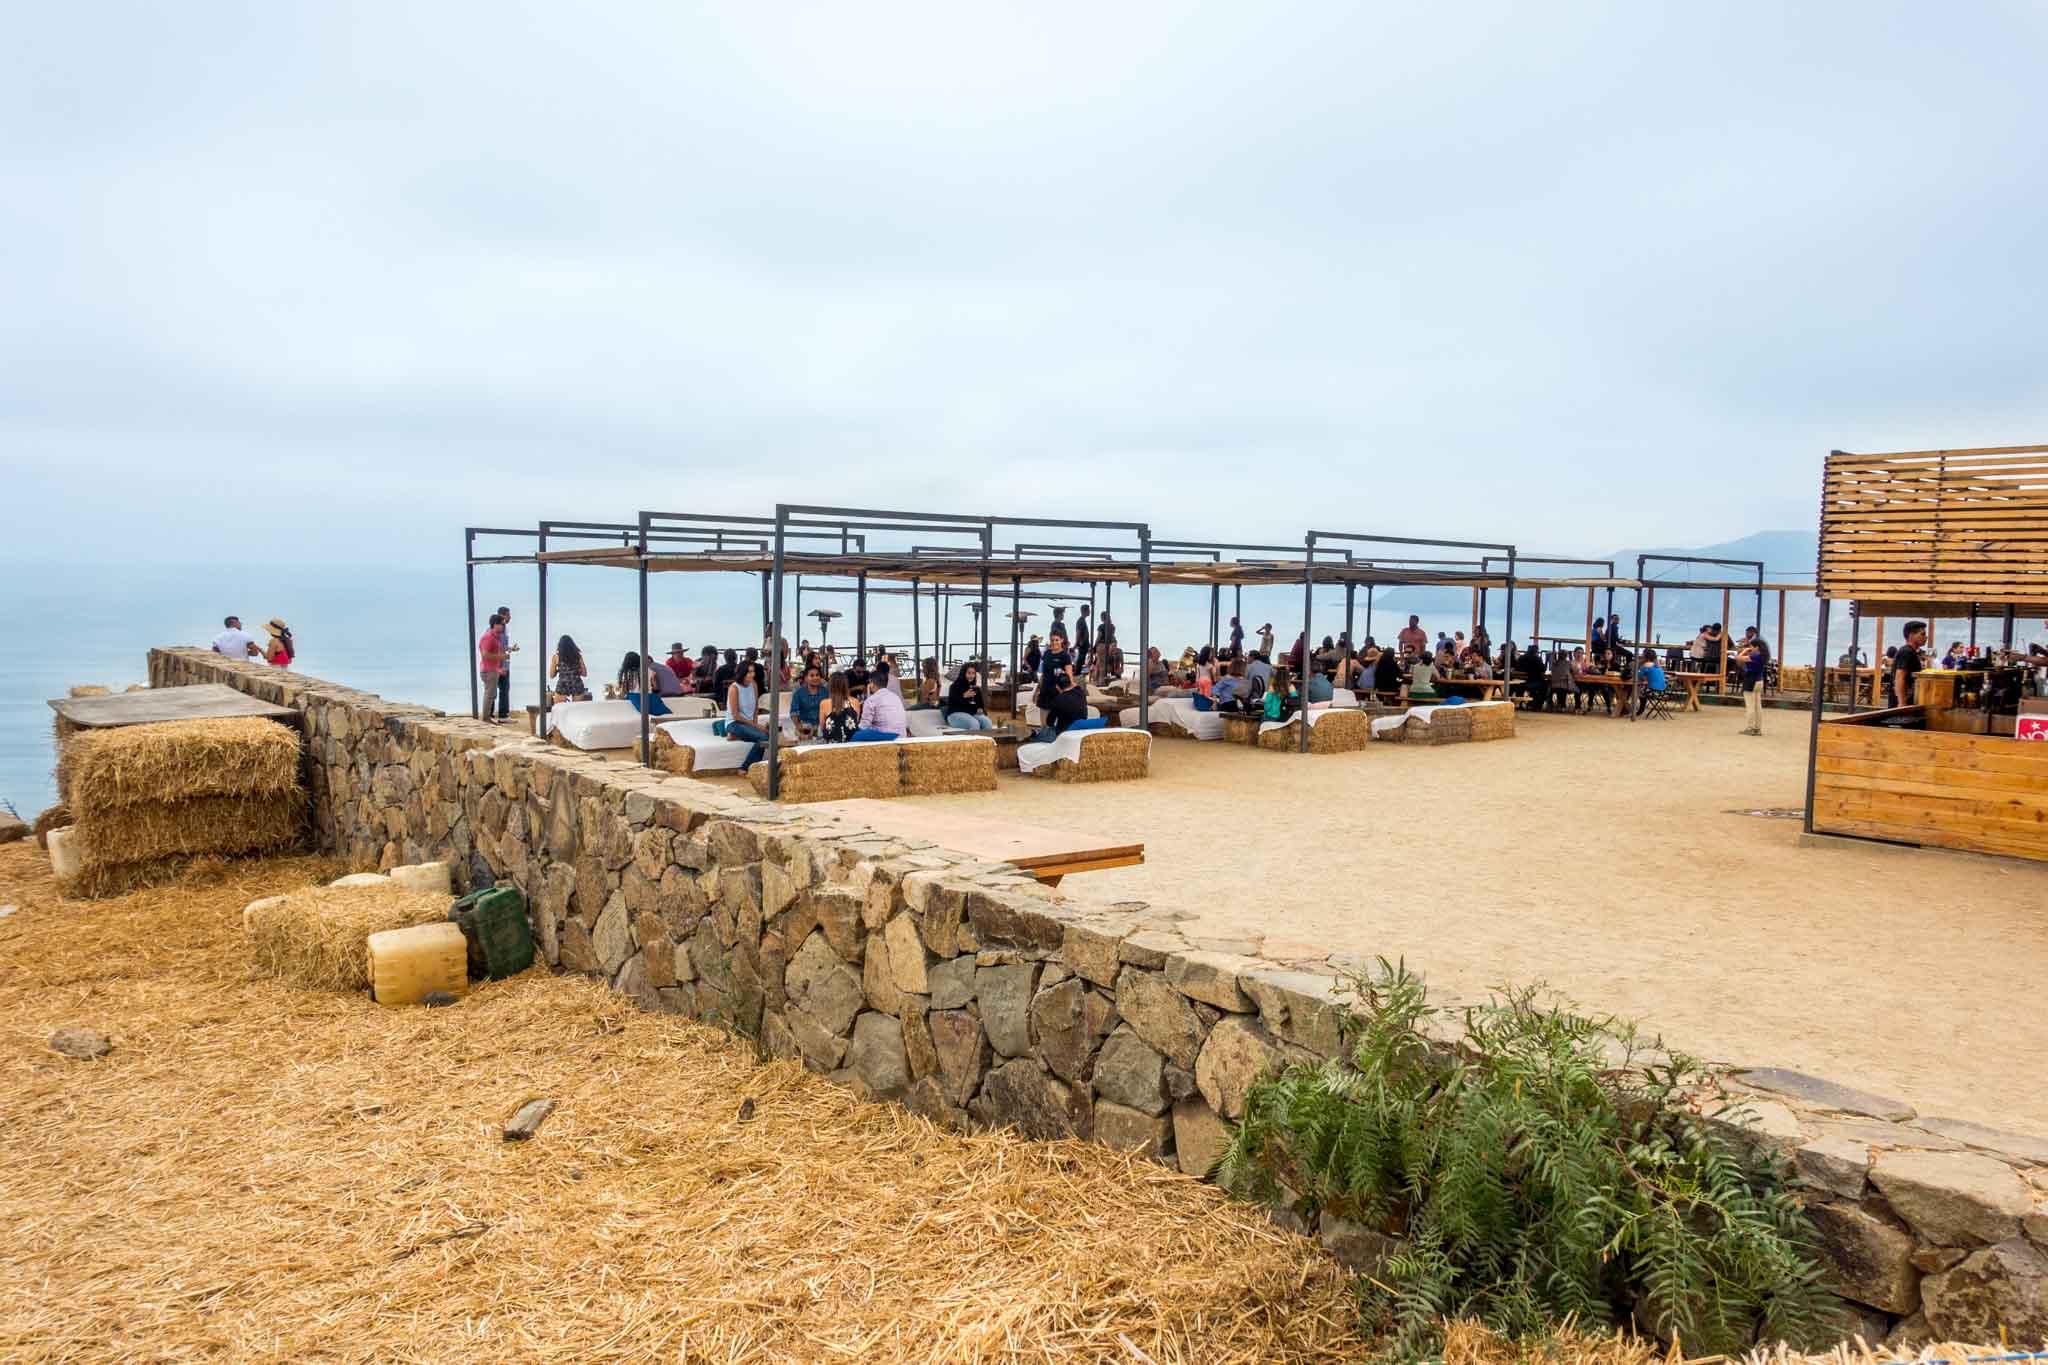 People enjoying views of the Pacific Ocean from Bar Bura at Cuatro Cuatros